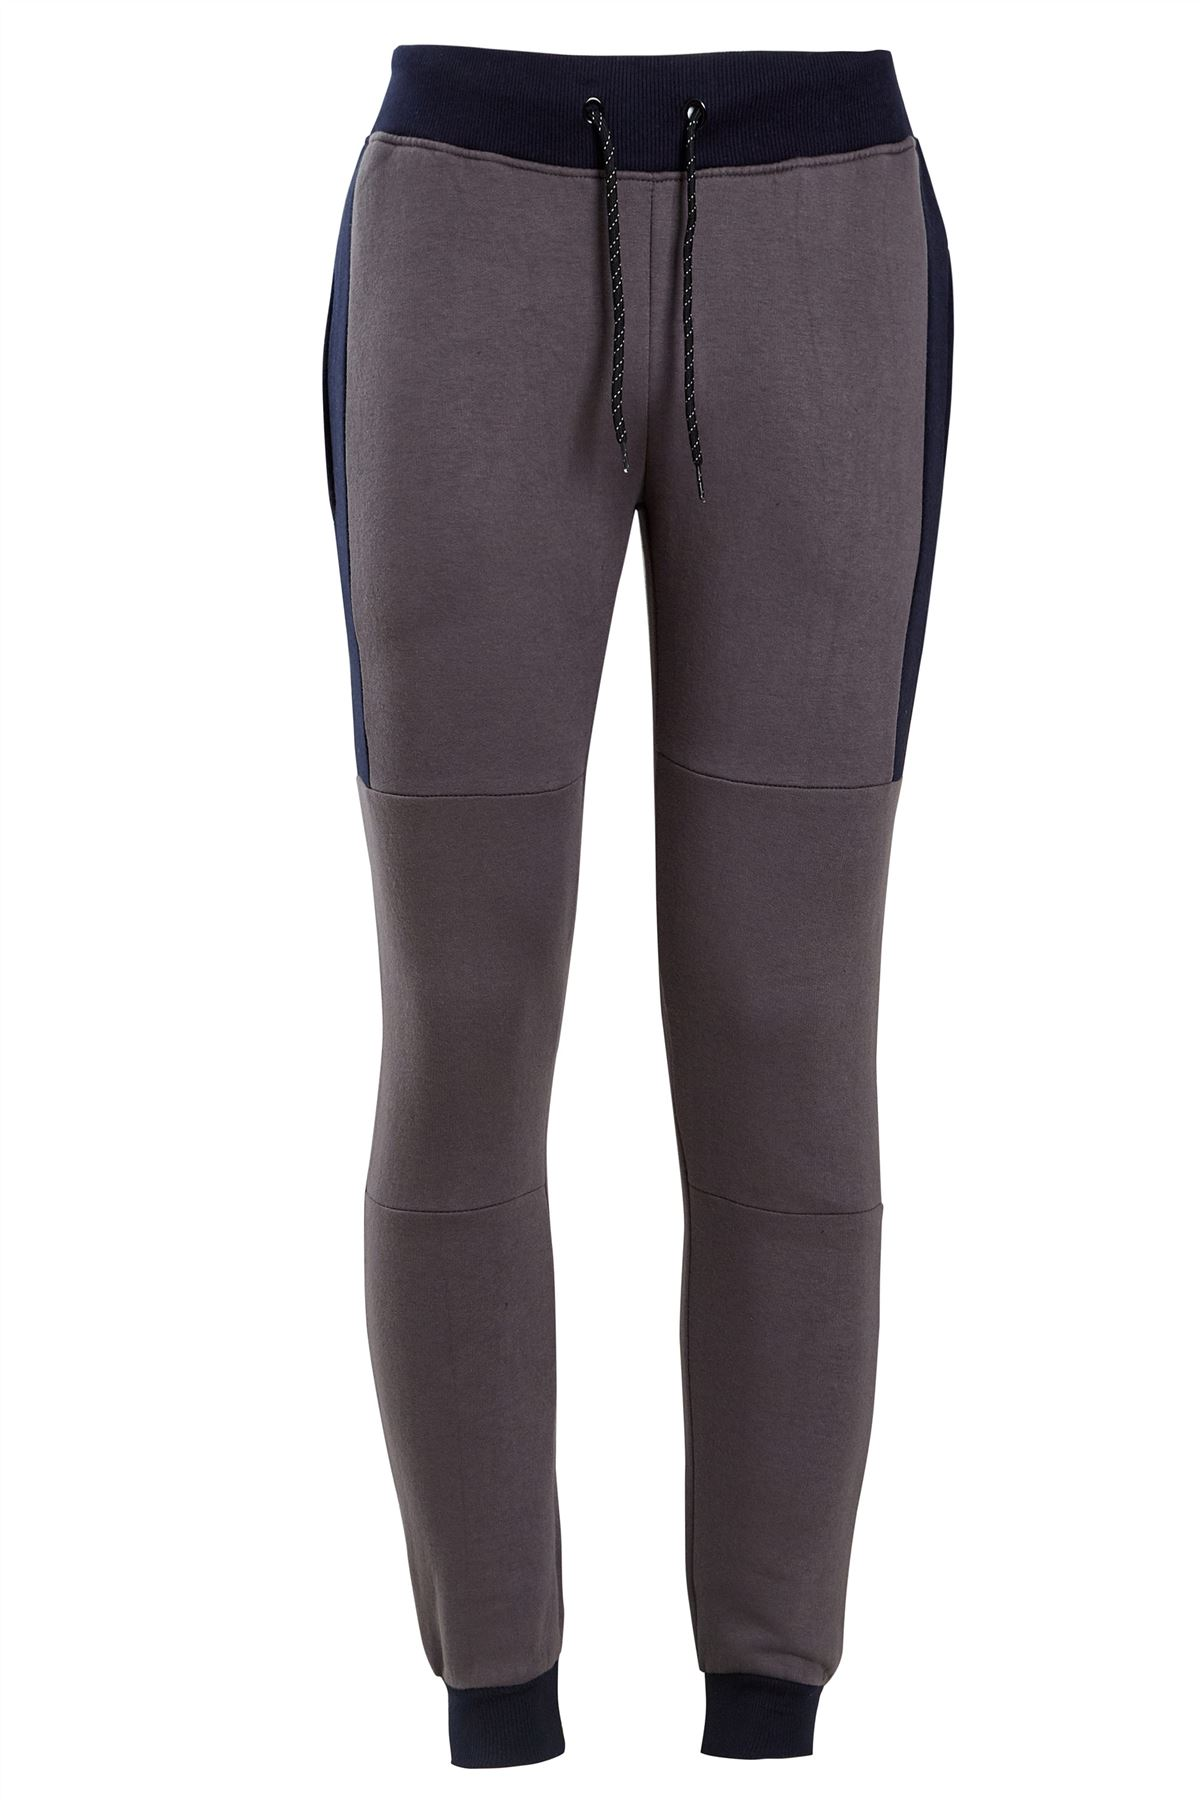 shelikes Mens Casual Contrast Panel Black Slim FIT Exercise Gym Jogging Zip Jacket Tracksuit